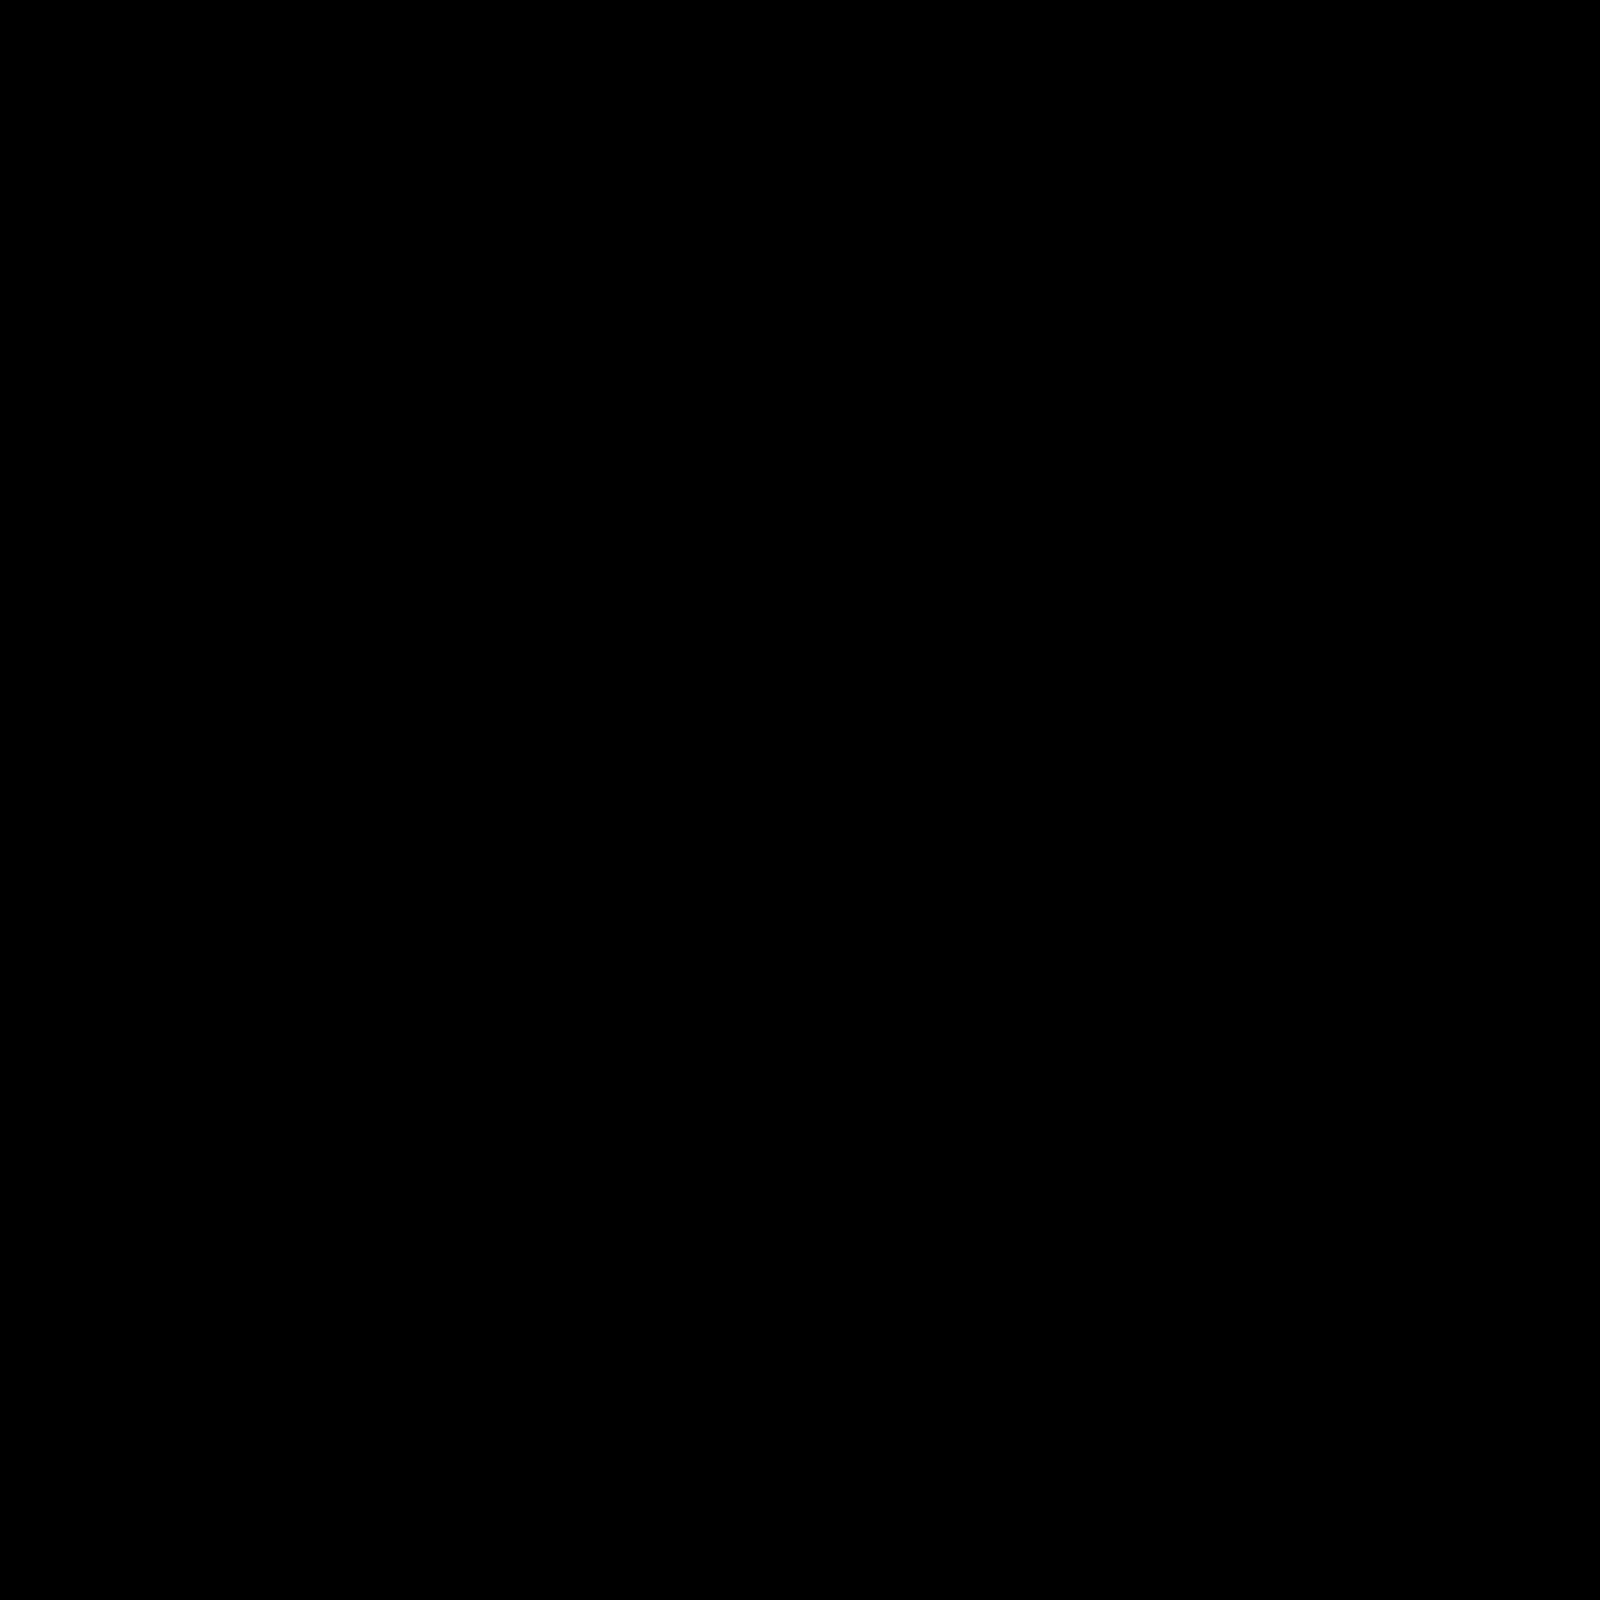 Send Job List icon